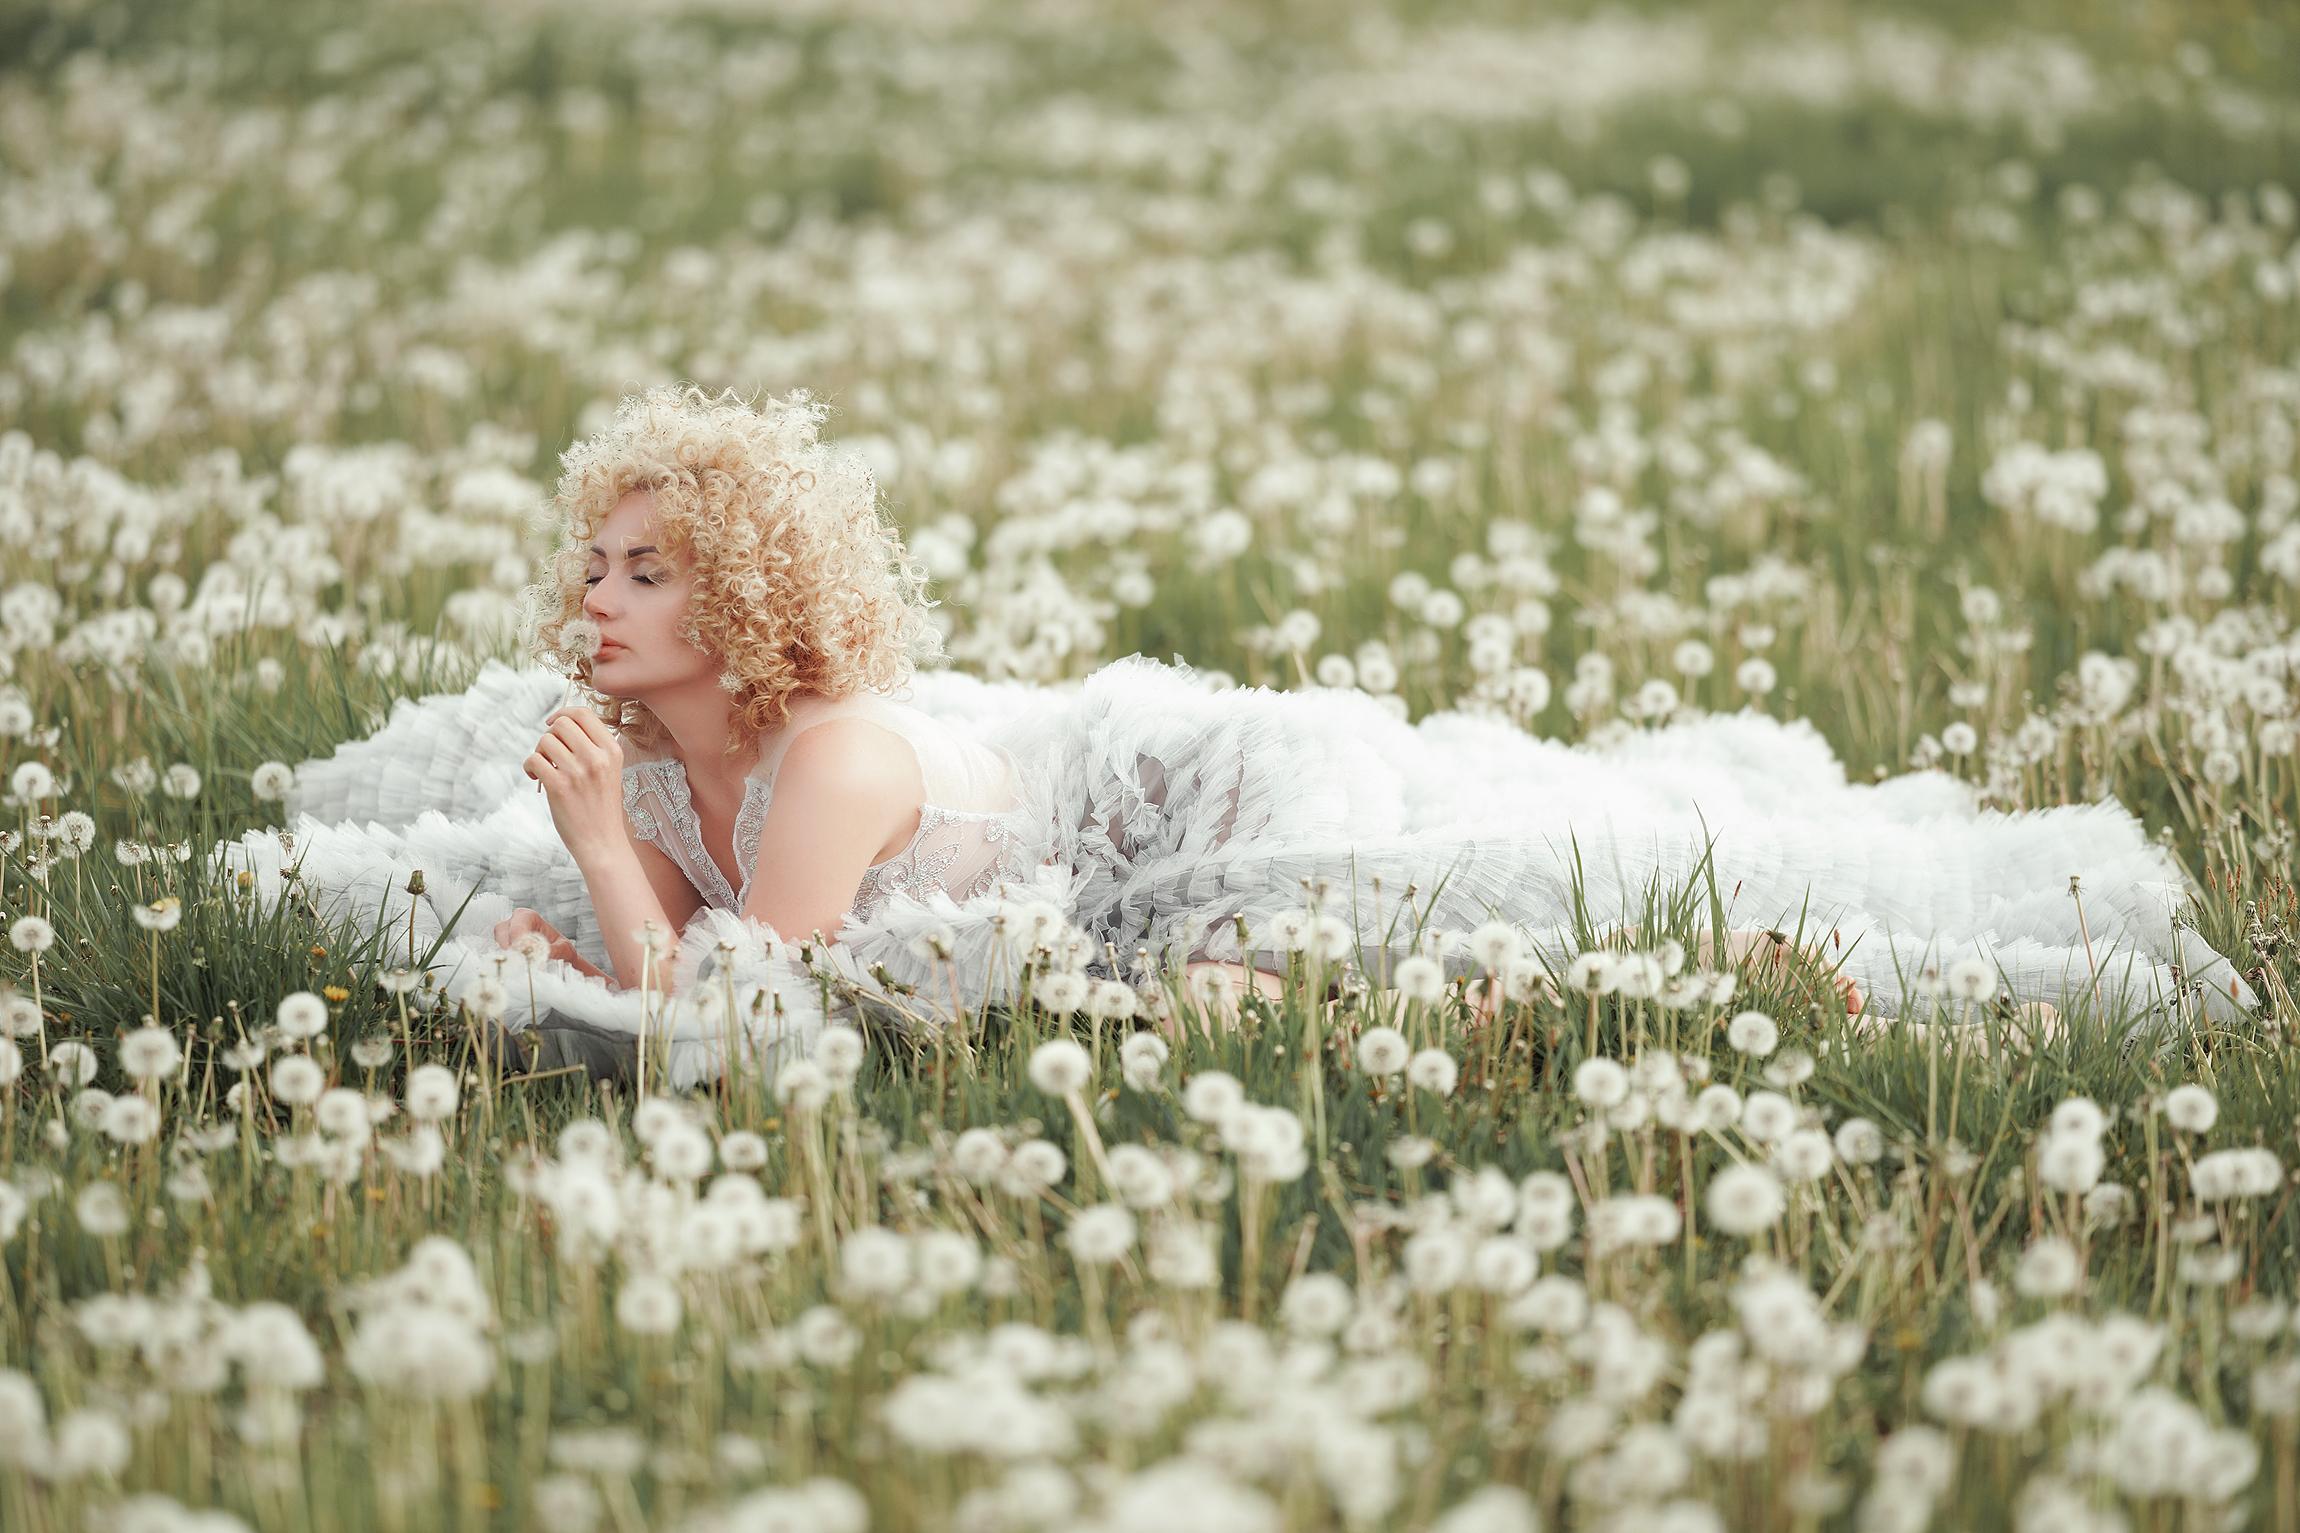 Мой Мир (мои правила) / фото Photographyzp Yana